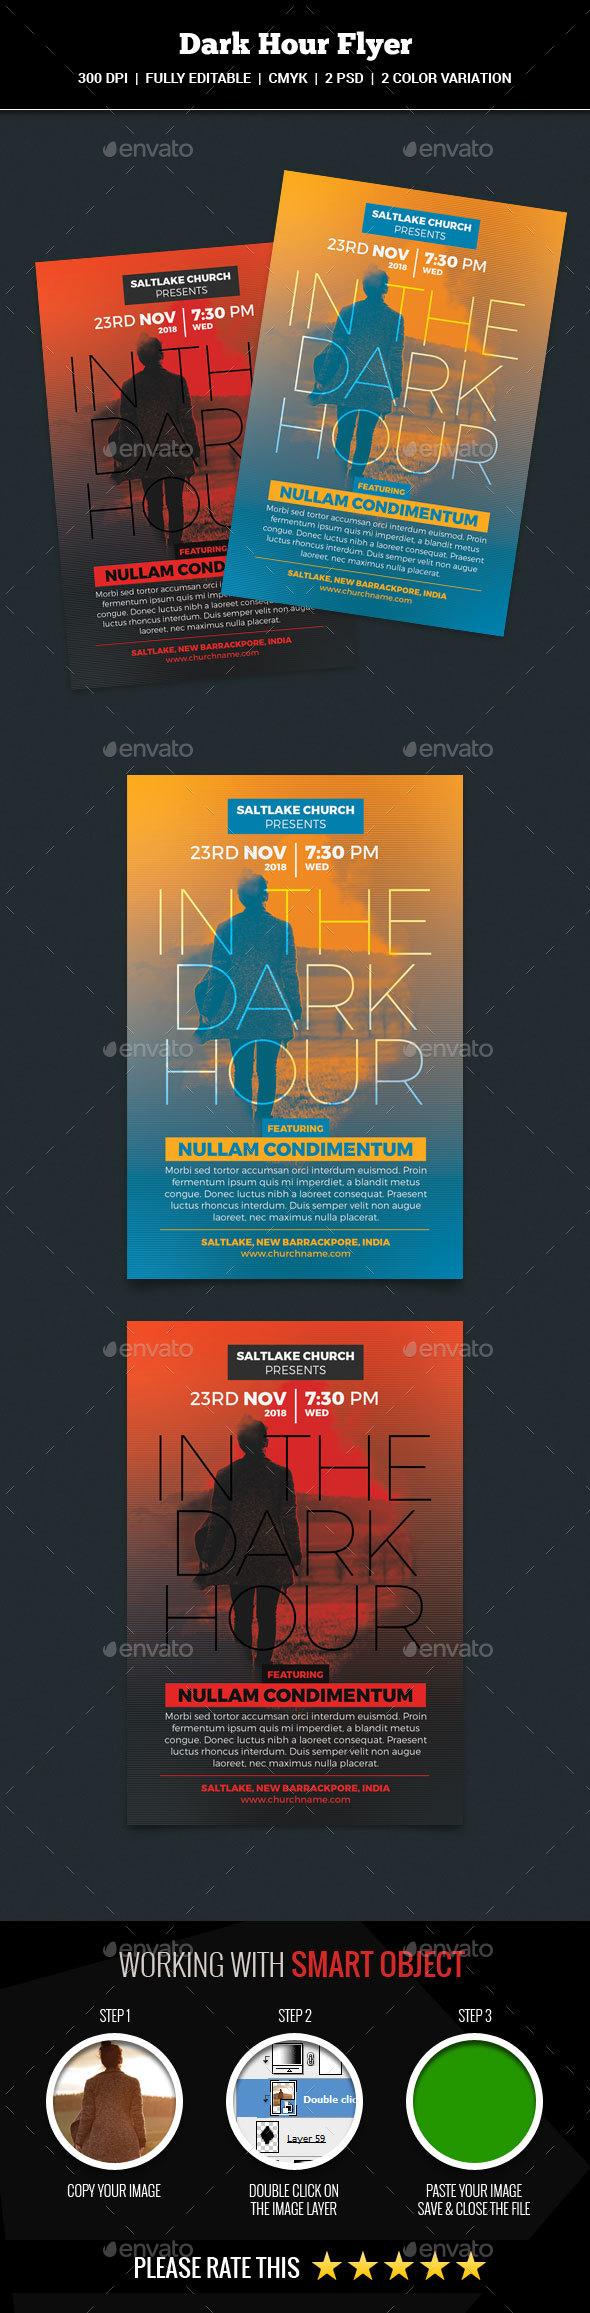 Dark Hour Church Flyer - Church Flyers